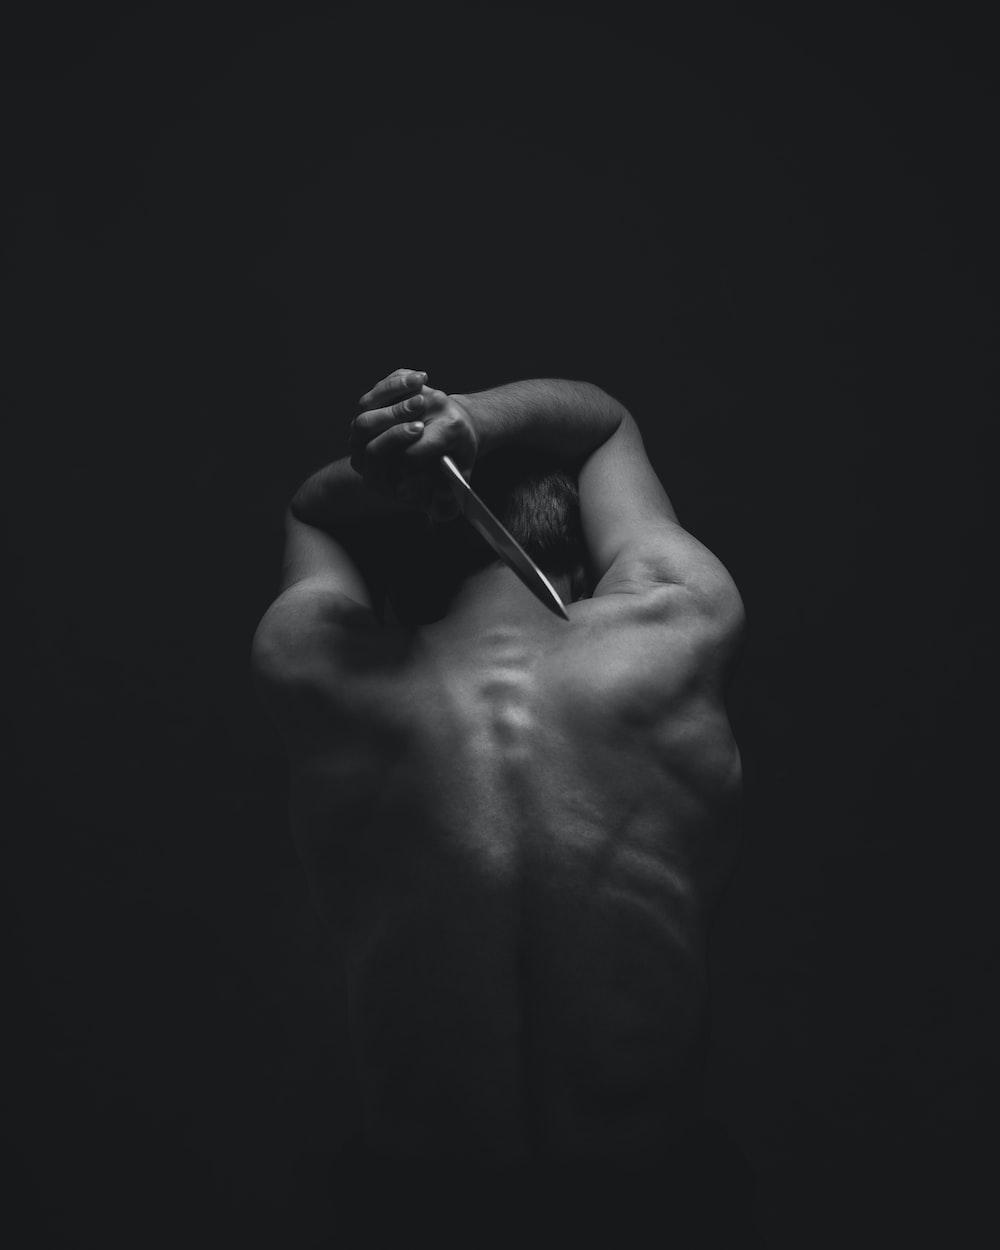 man holding gray dagger